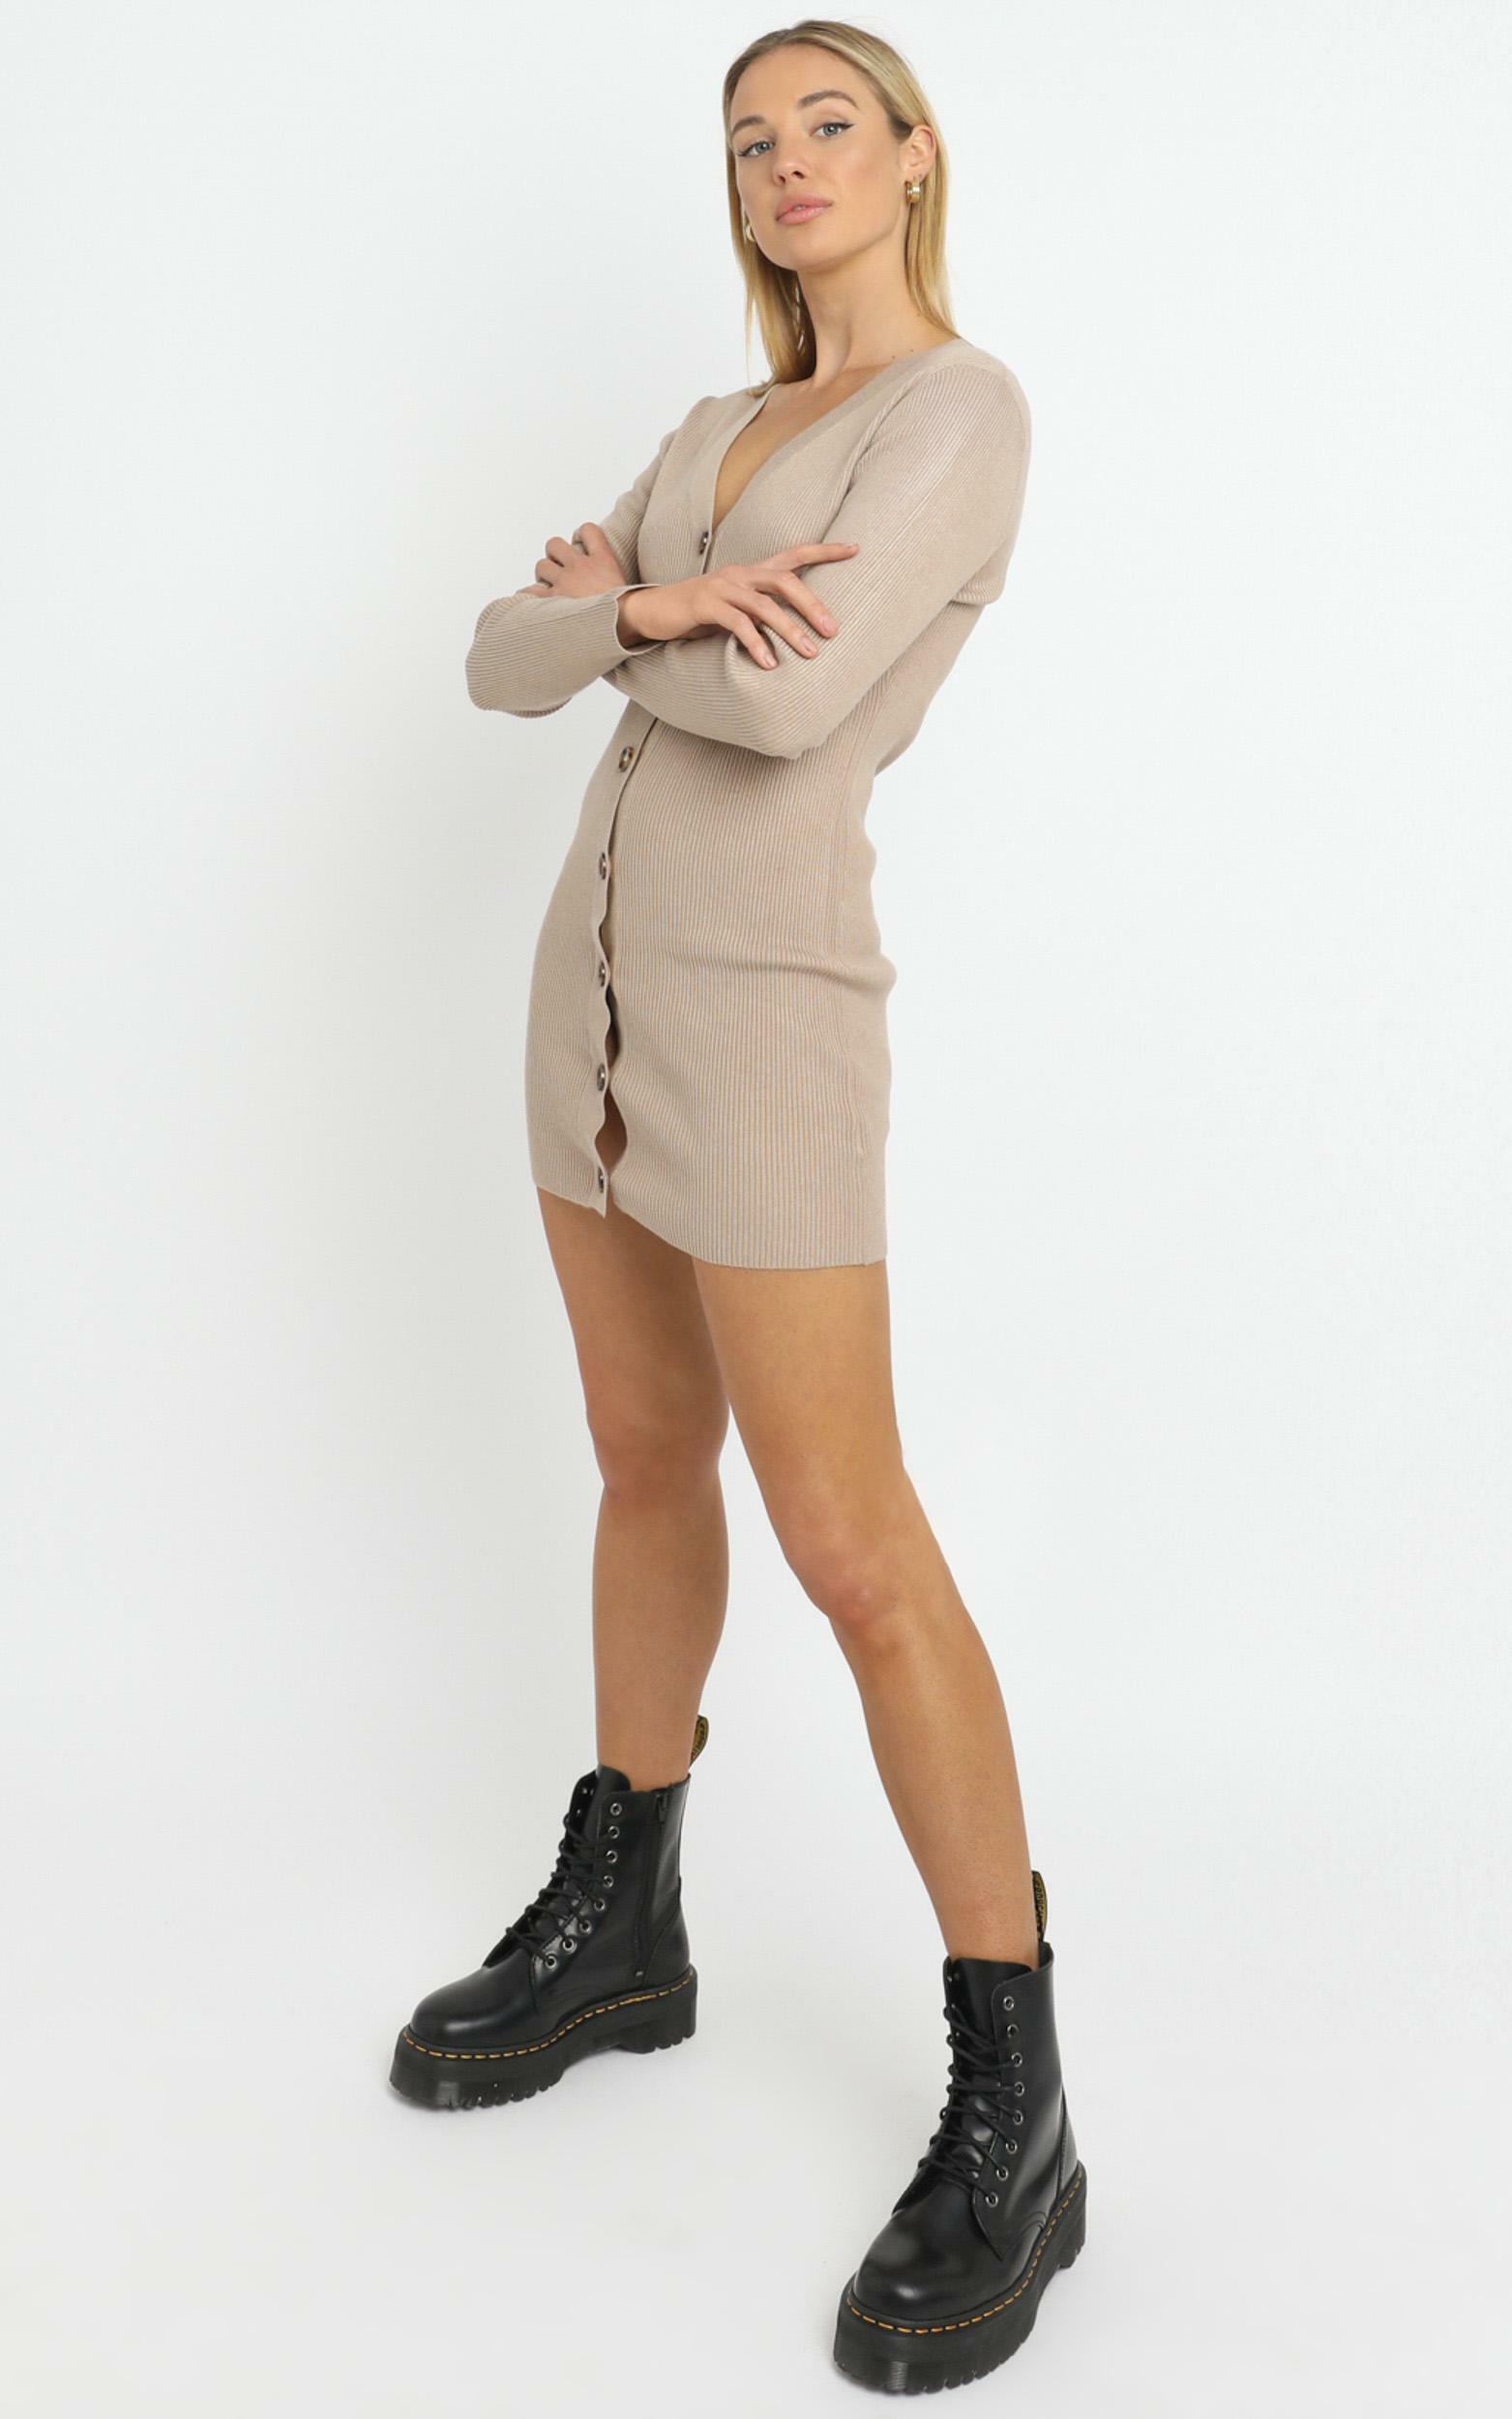 Earie Knit Dress in Beige, Beige, hi-res image number null